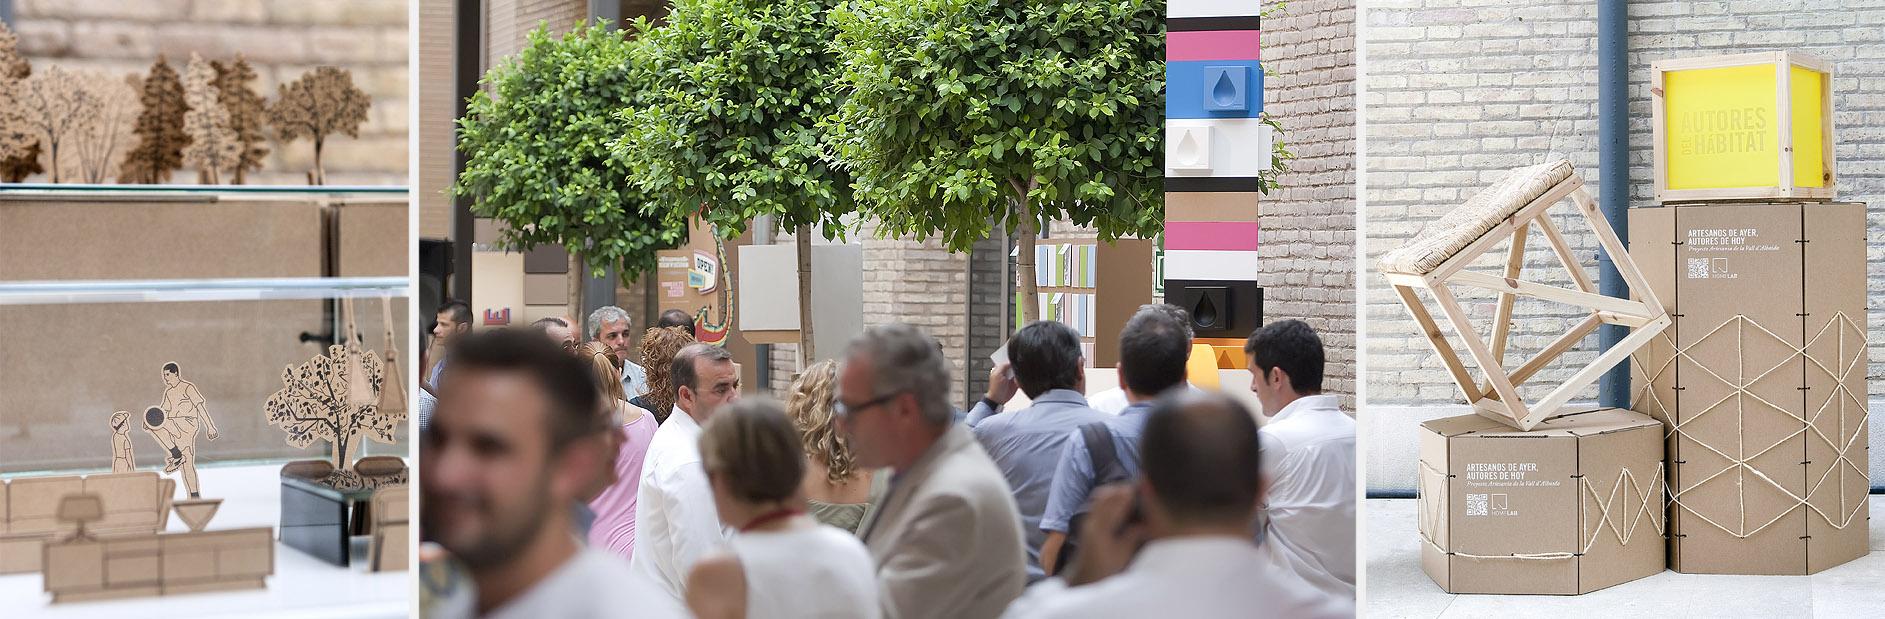 Encuentros EAD 2012 | CDICV | samarucestudio.com